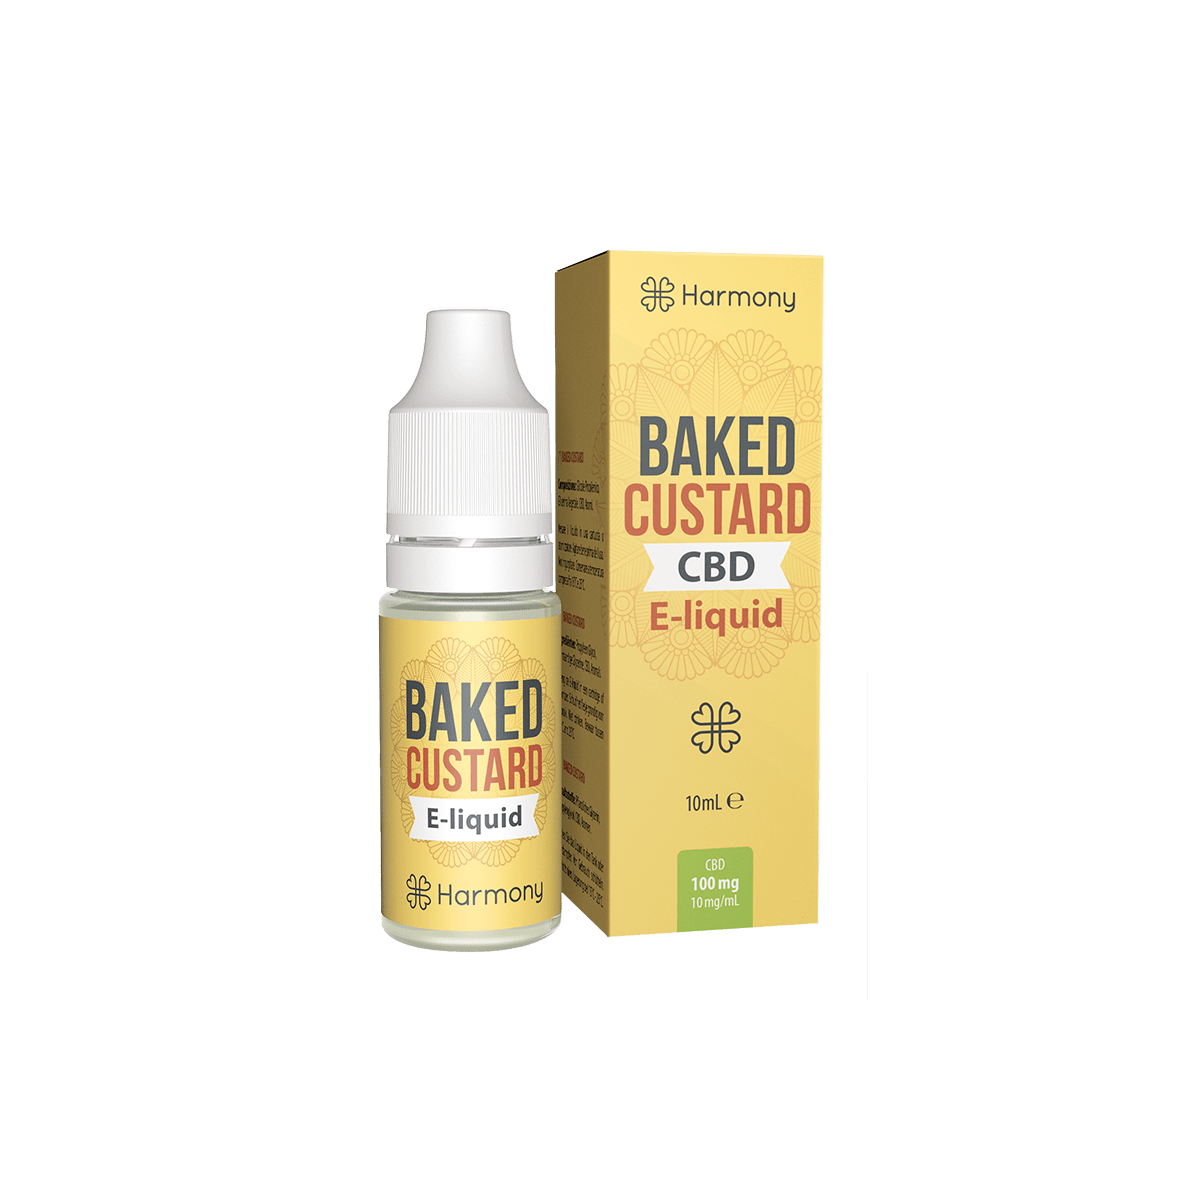 CBD Liquid | HARMONY - Baked Custard | Menge 10 ml - 600 mg im Preisvergleich